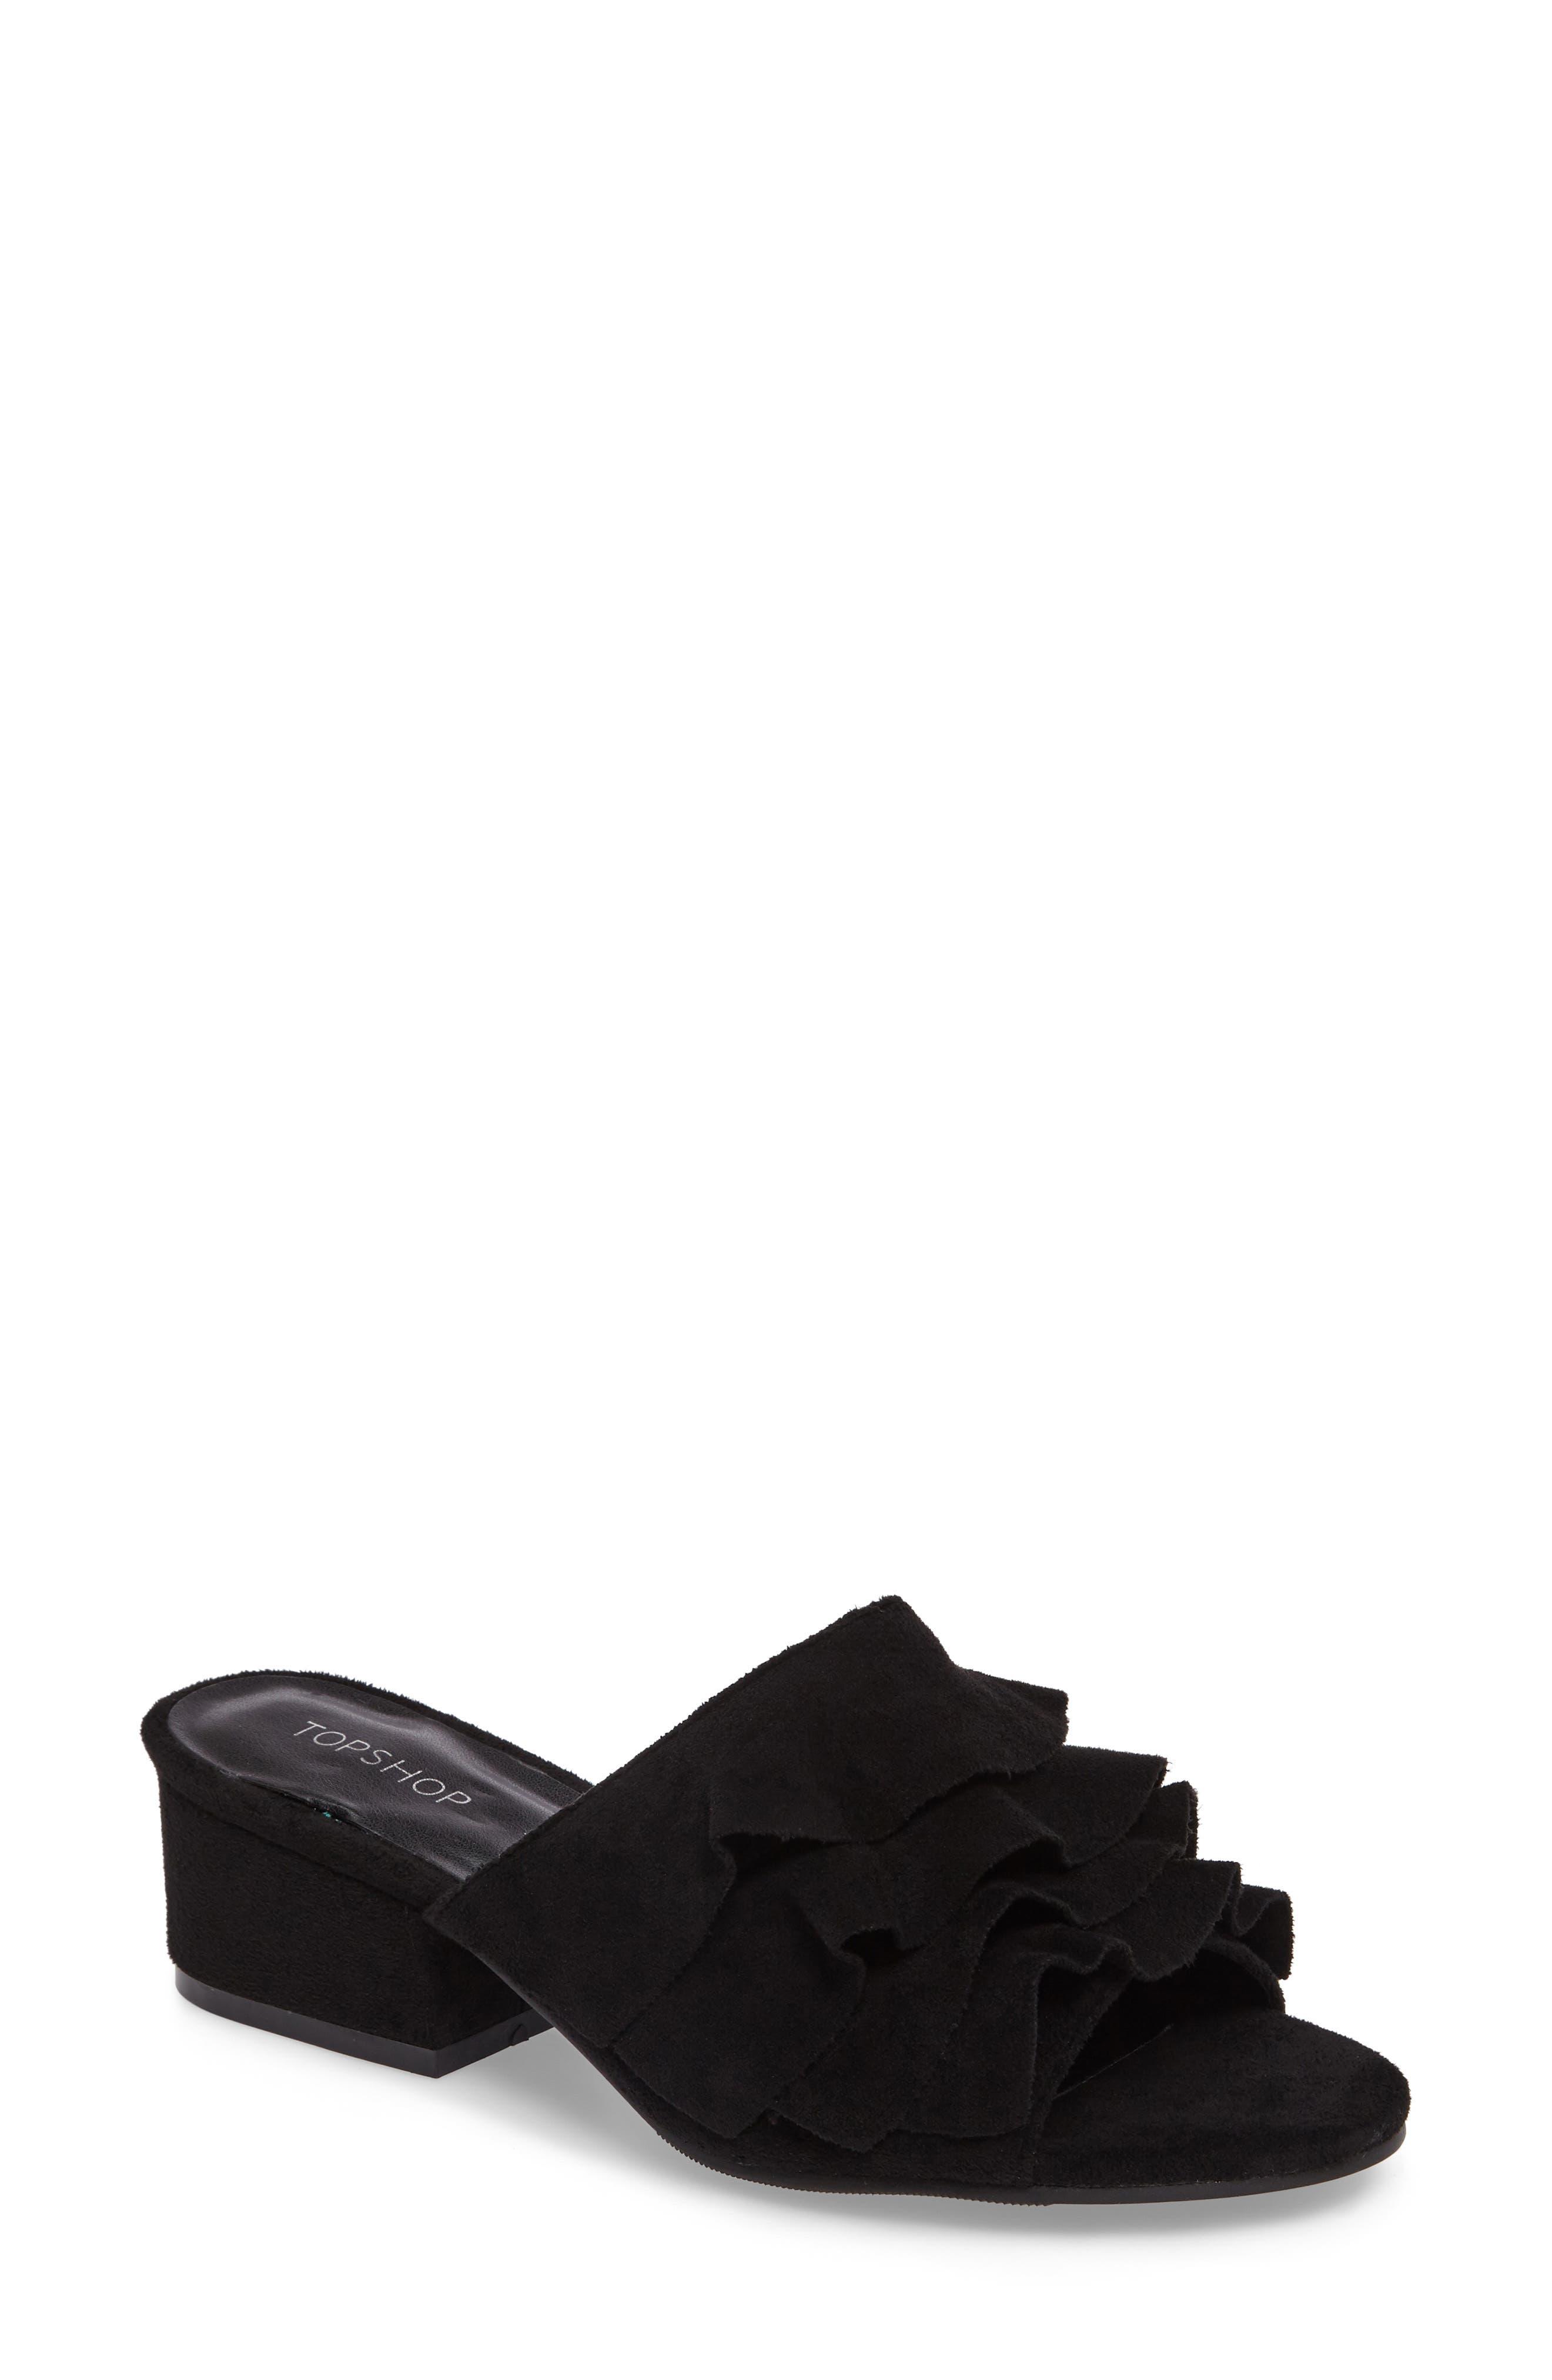 Alternate Image 1 Selected - Topshop Darcy Ruffle Slide Sandal (Women)